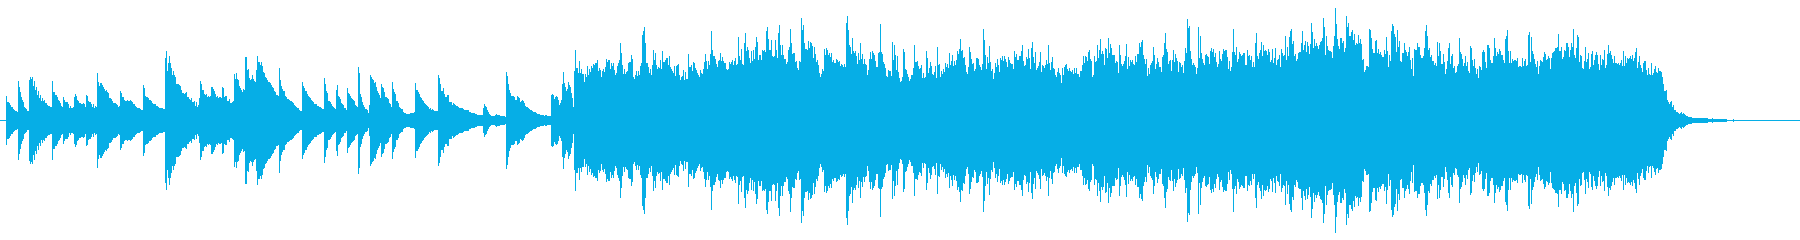 Calm Orchestra 3の再生済みの波形